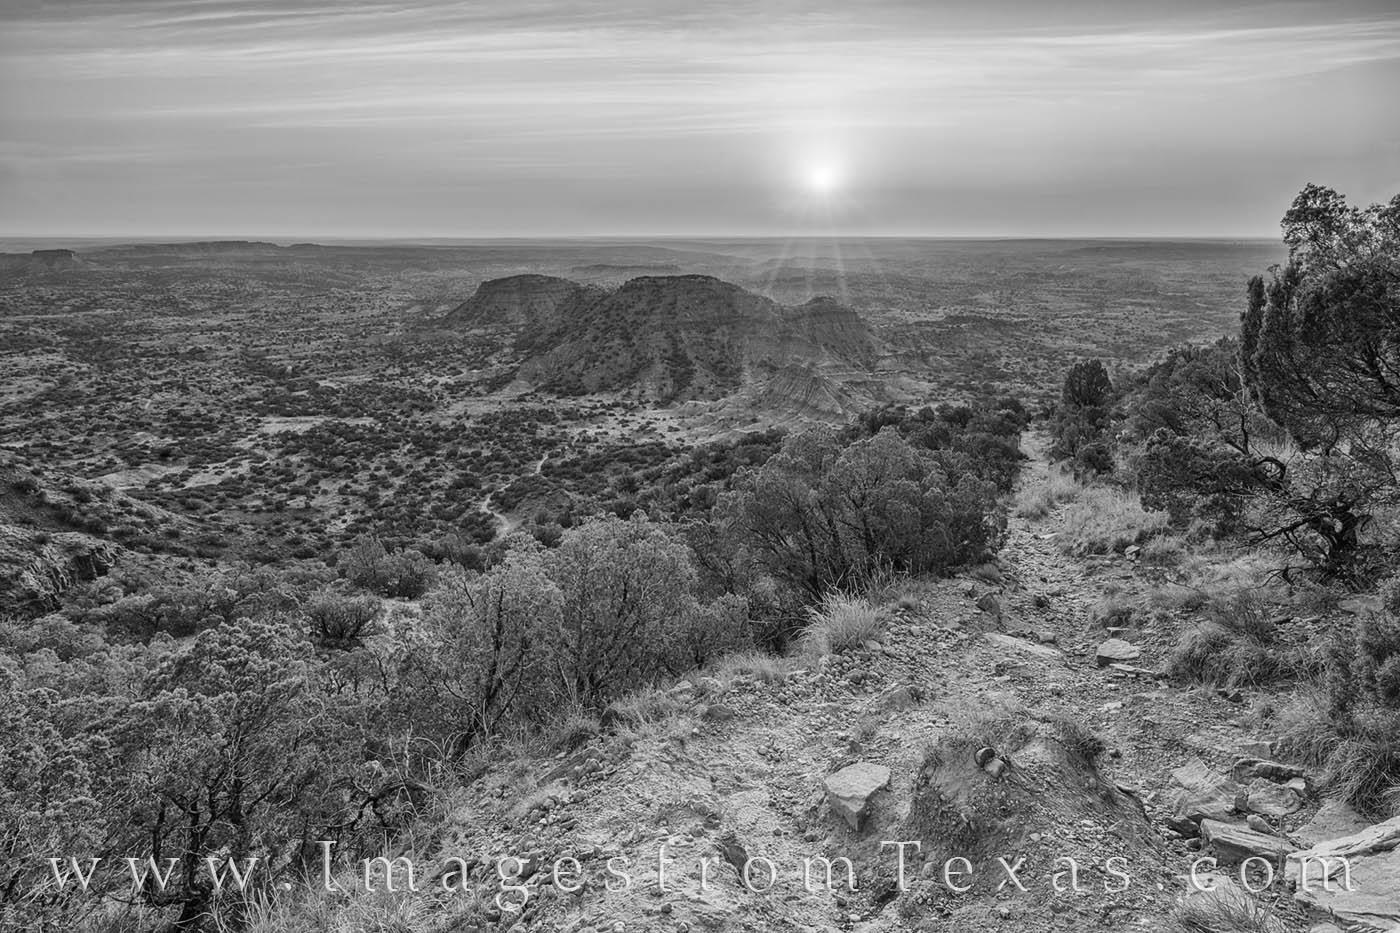 haynes ridge, caprock canyon, sunrise, hiking, caprock canyons state park, caprock prints, west texas, briscoe county, texas landscapes, photo